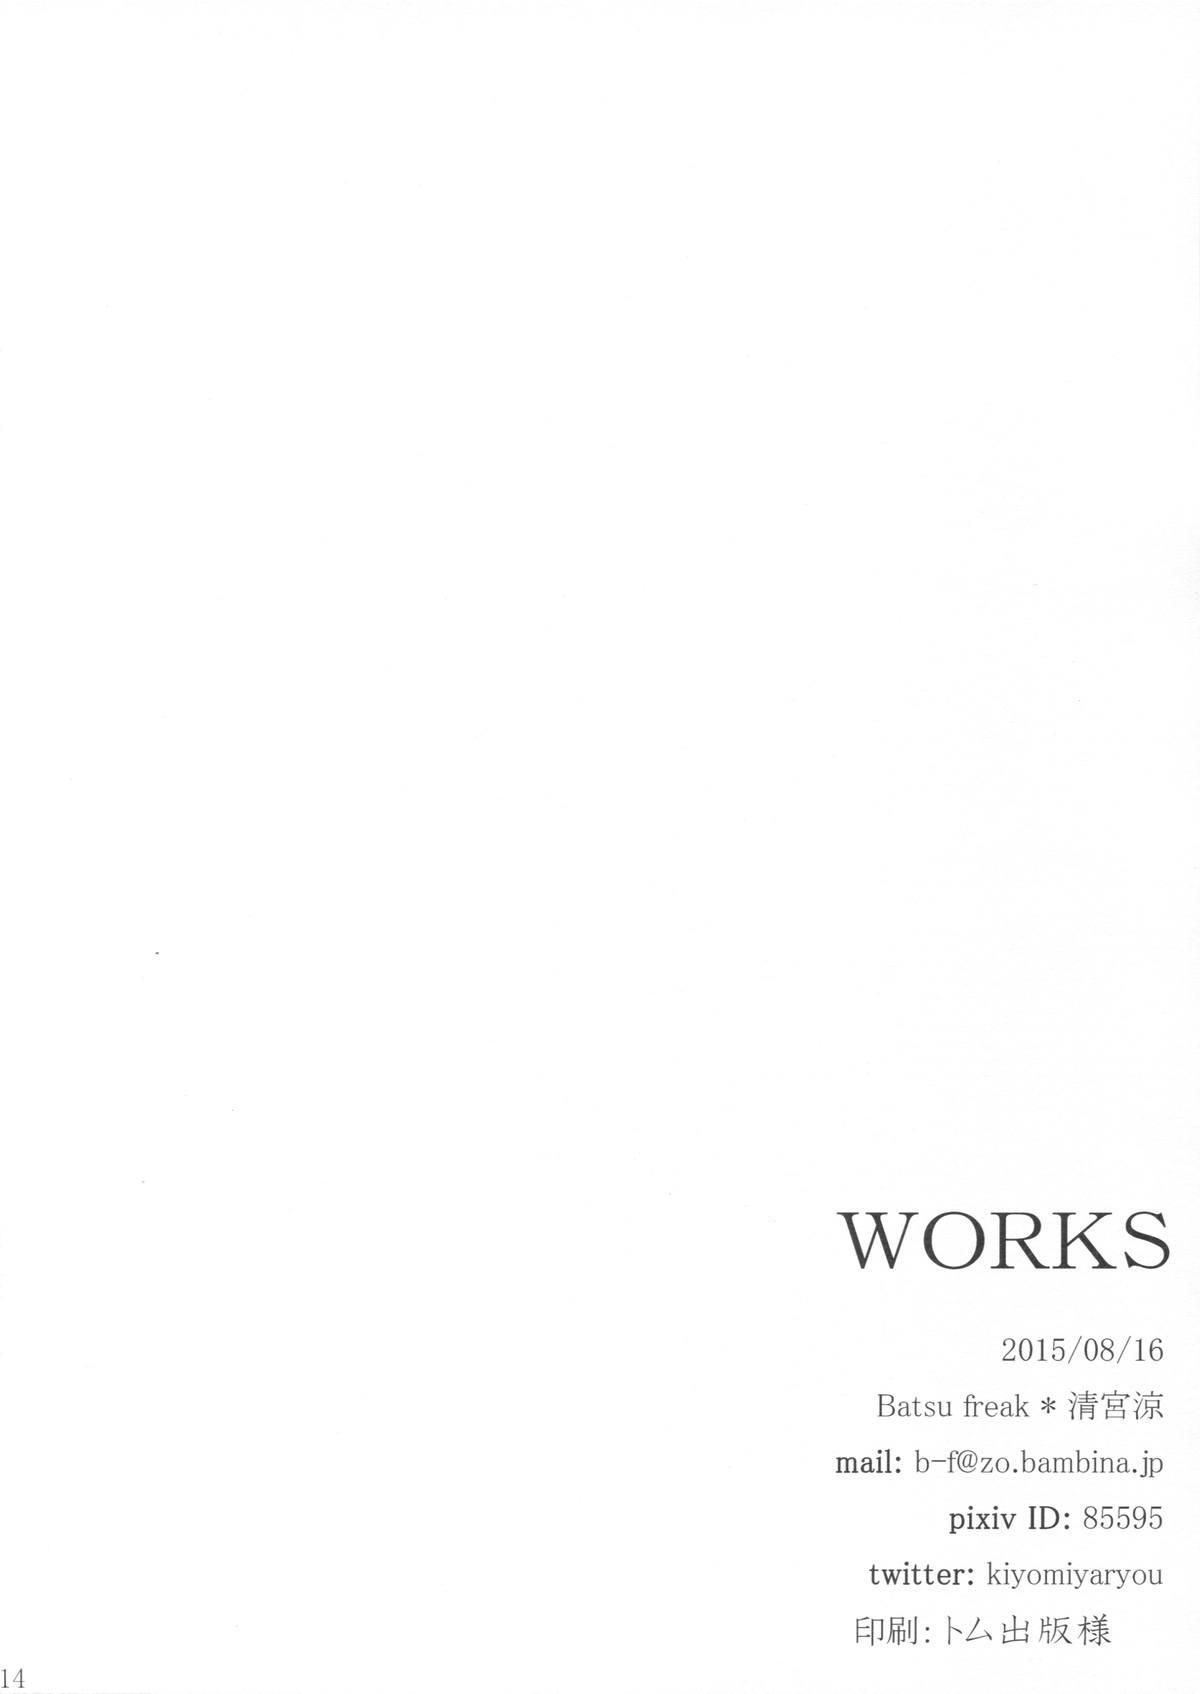 Works 12